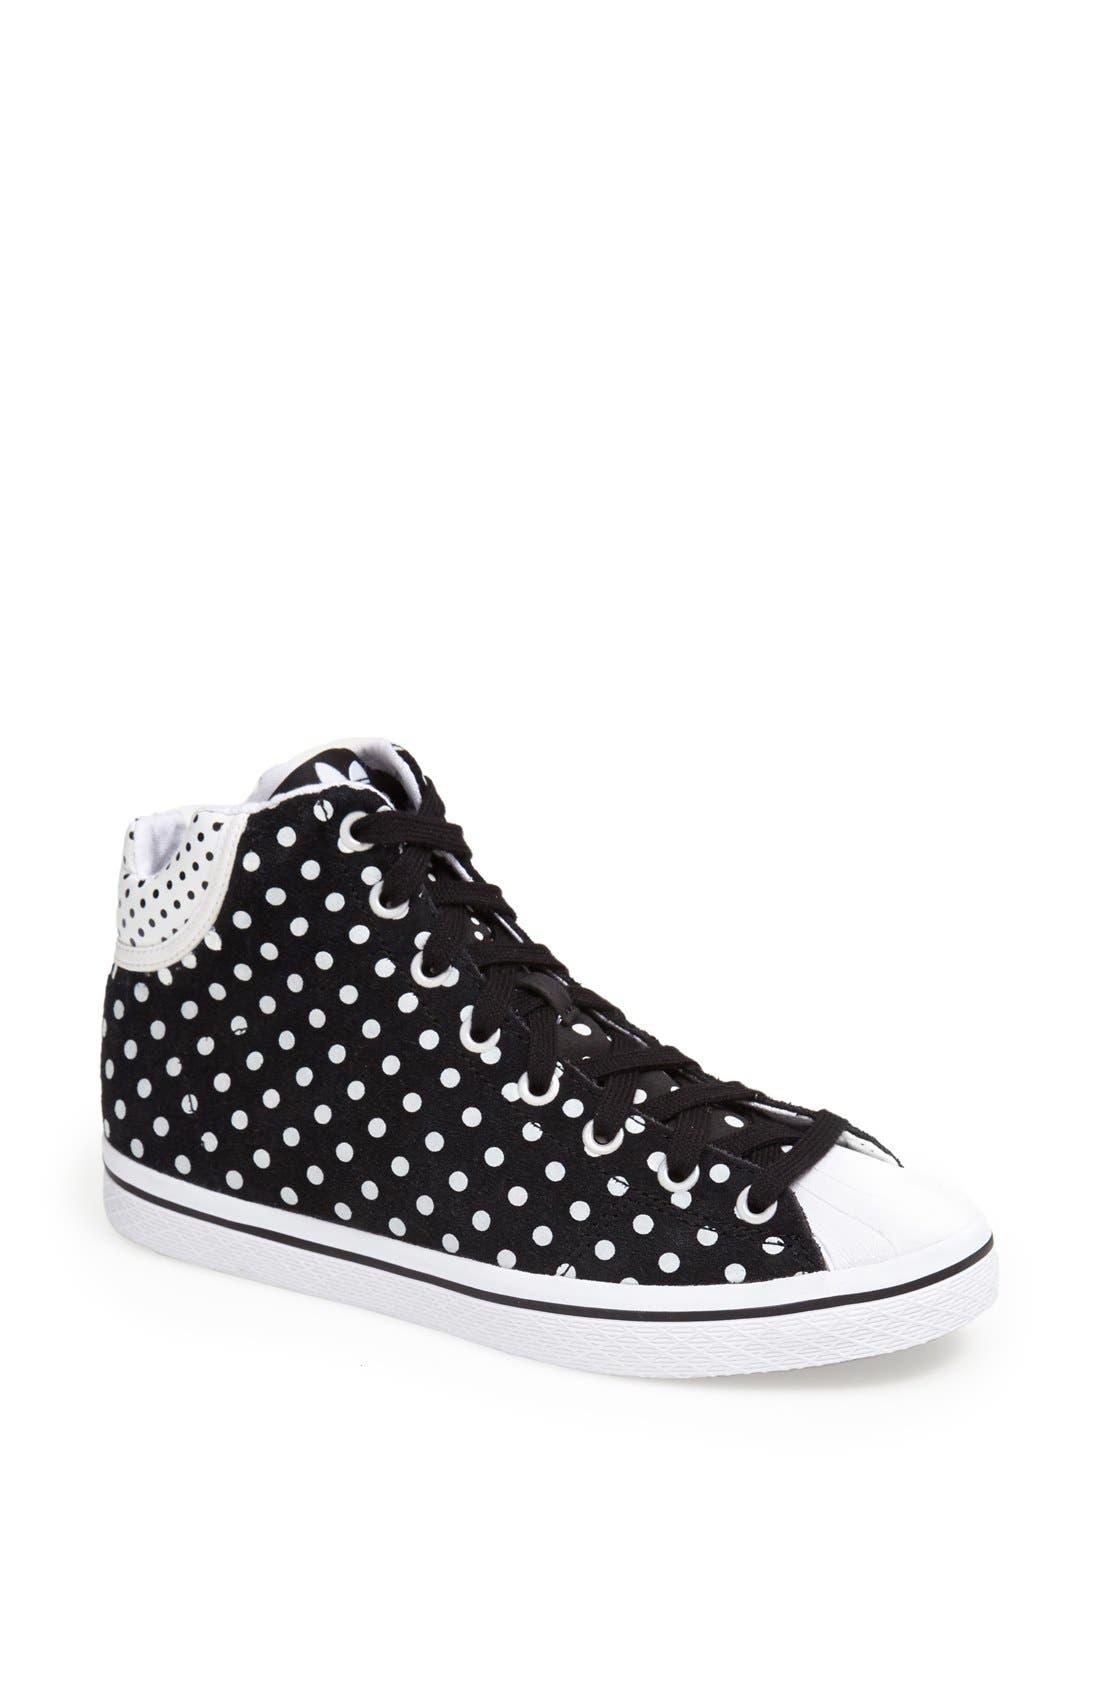 'Star' High Top Sneaker,                             Main thumbnail 1, color,                             001